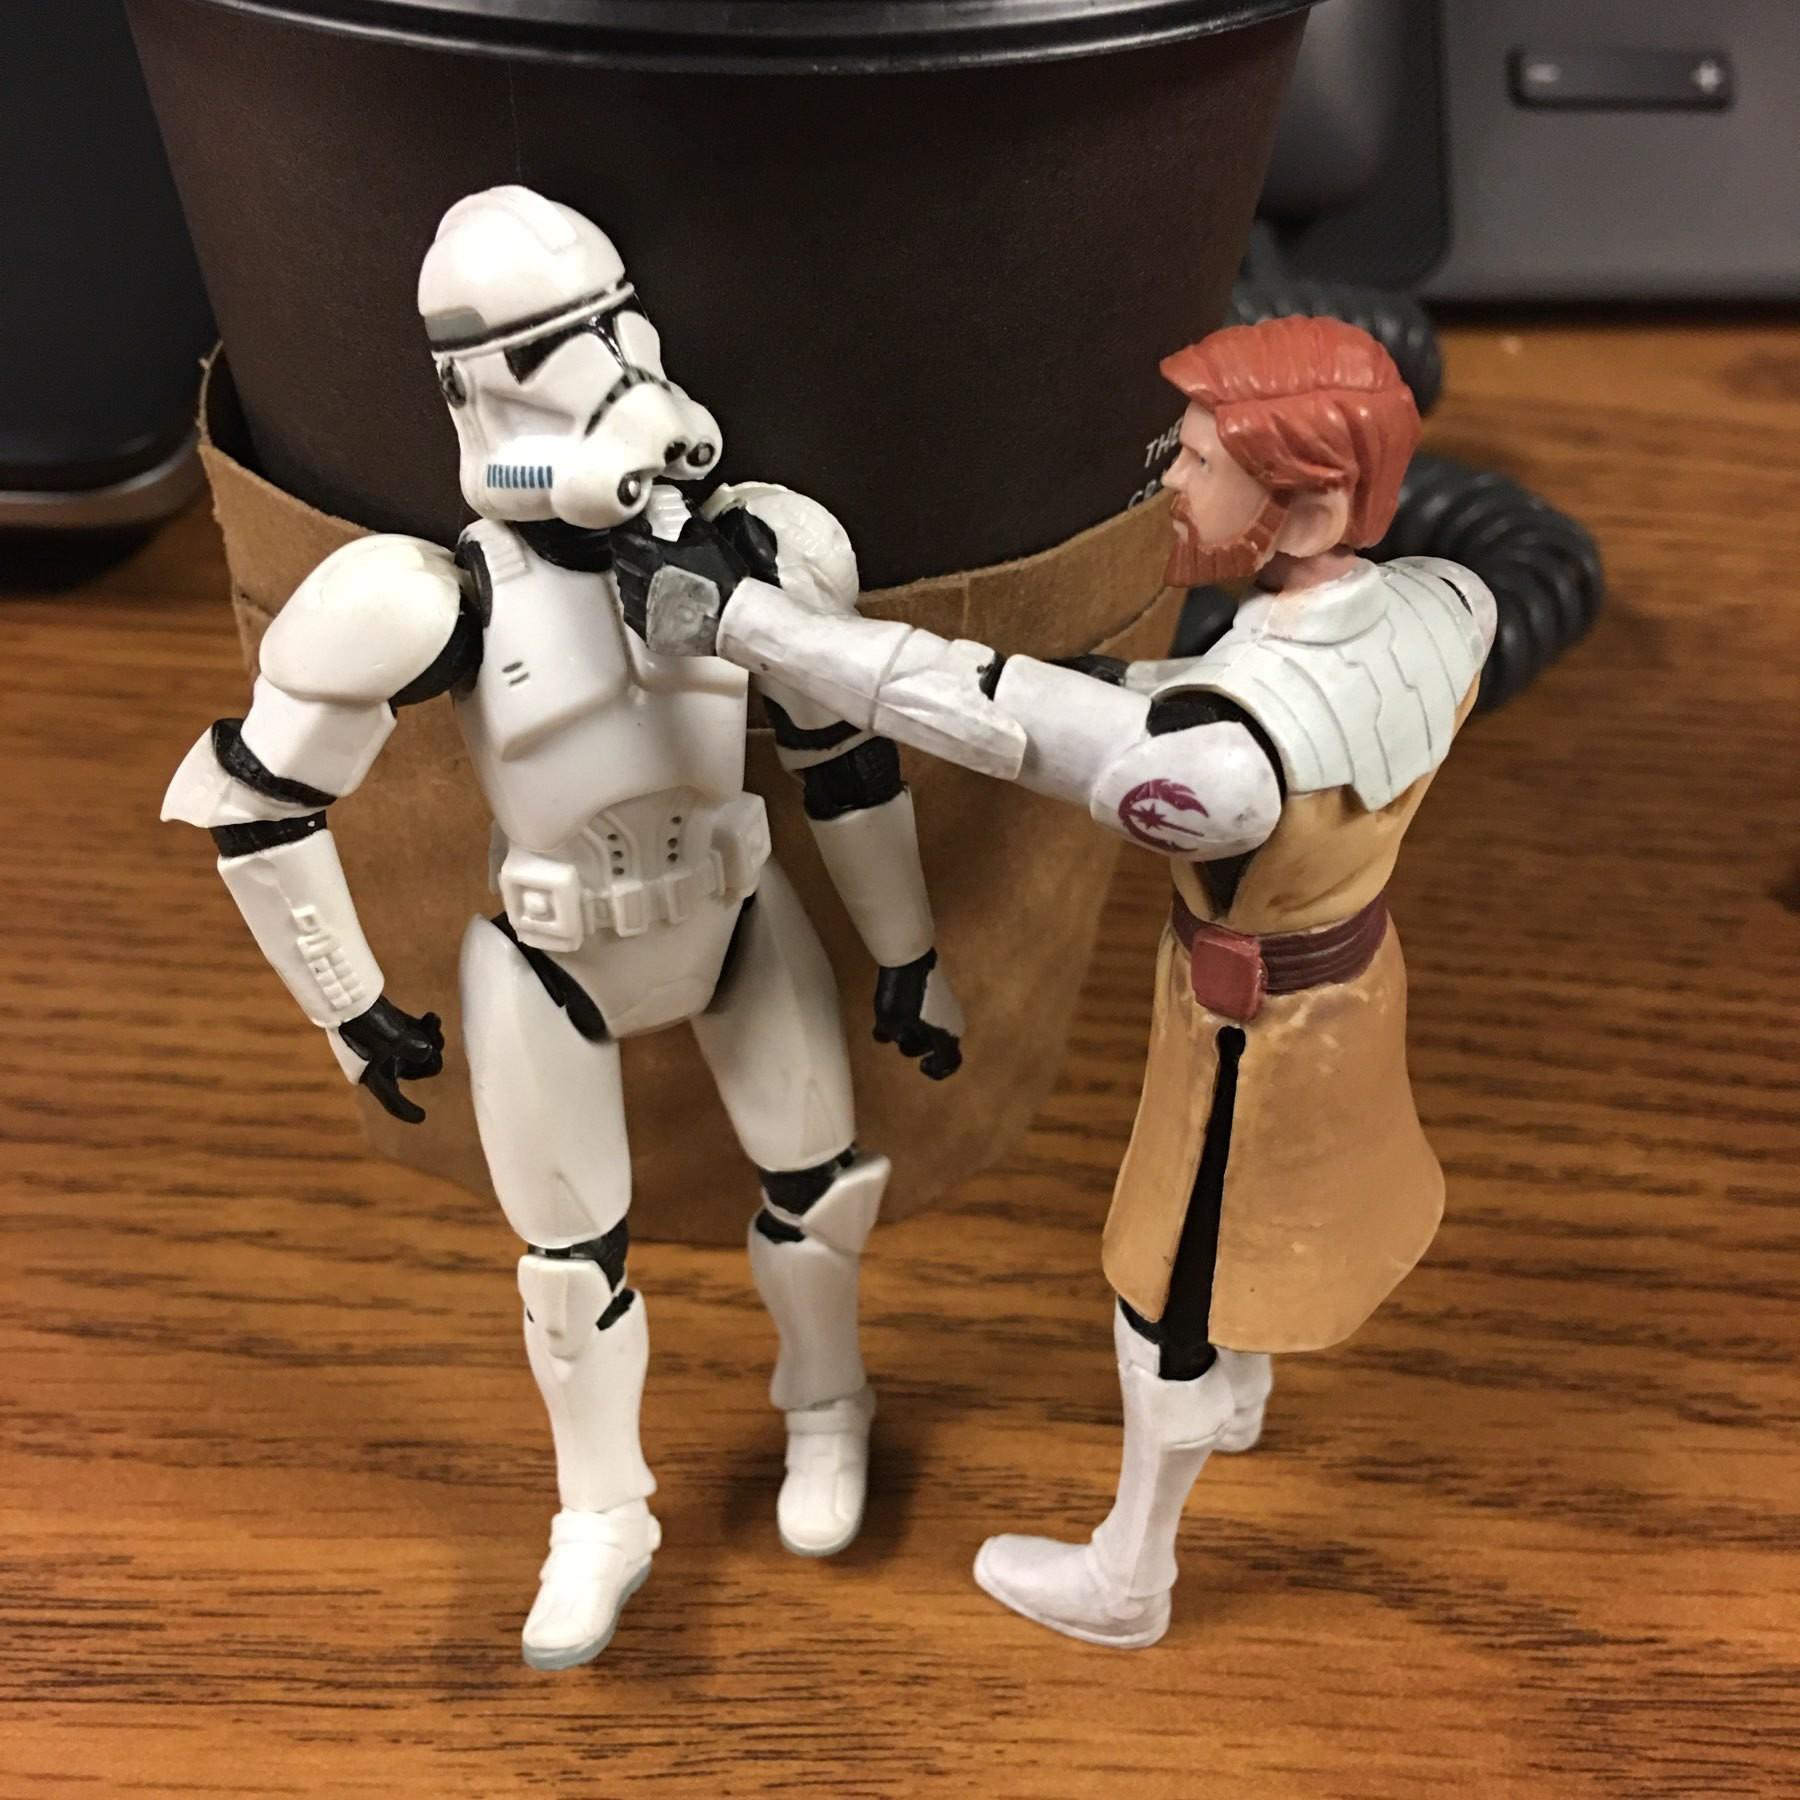 Obi-Wan punching a storm trooper.